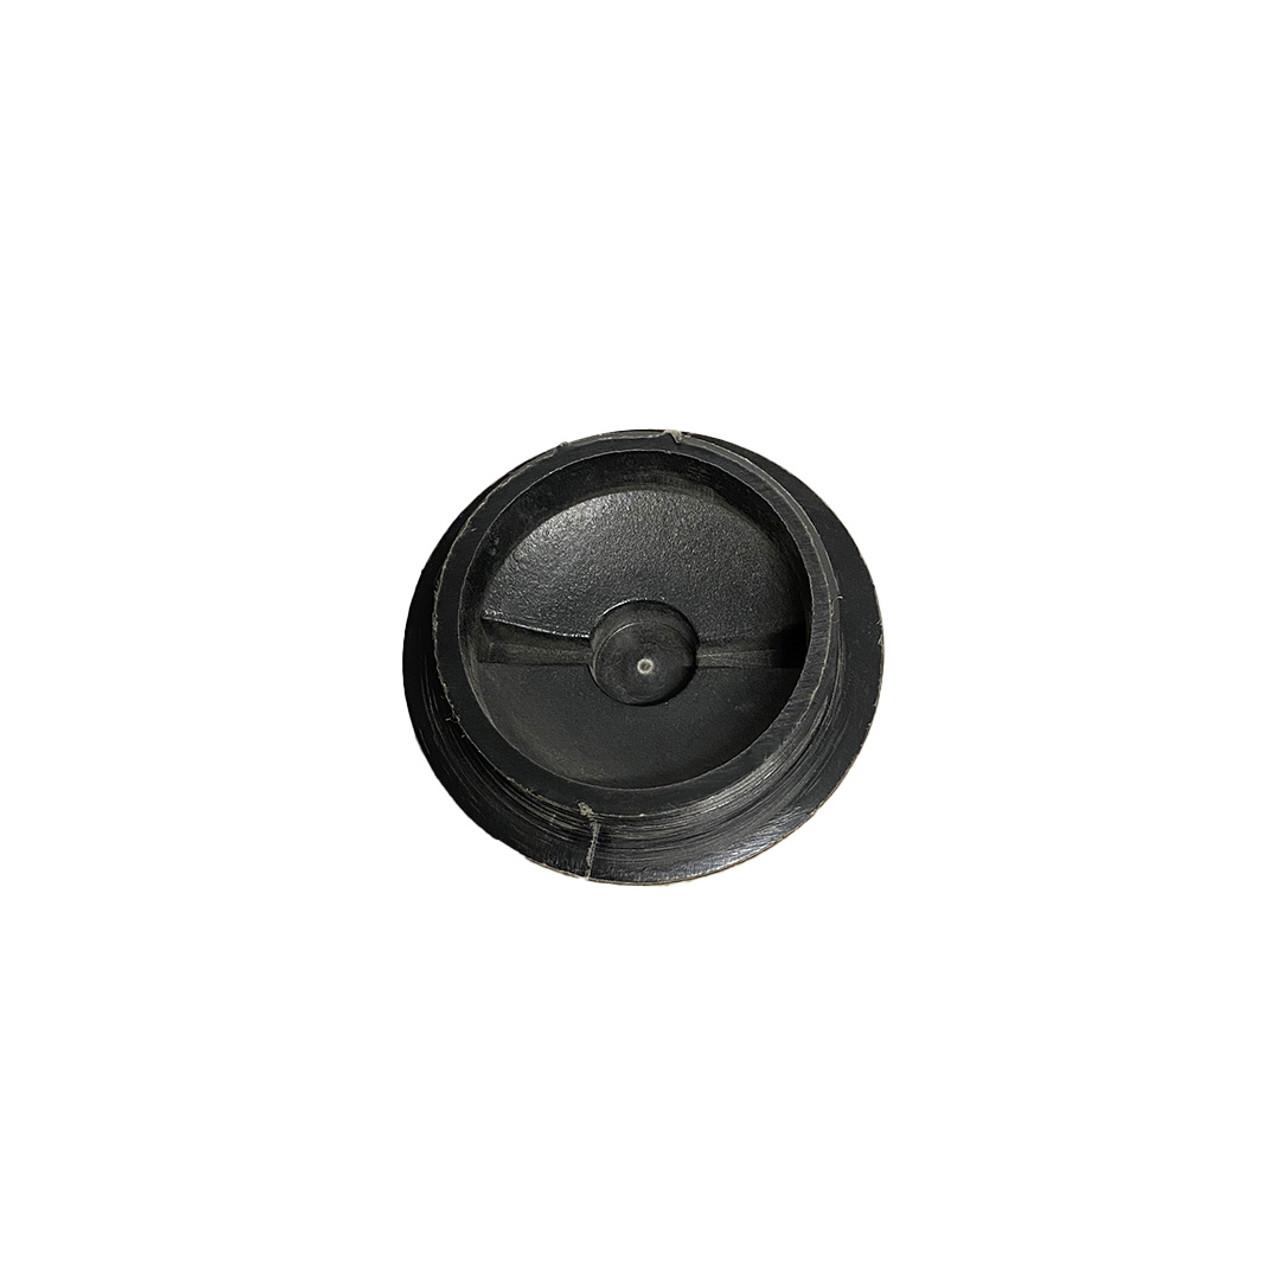 Drain Valve Cap with Sealing Ring